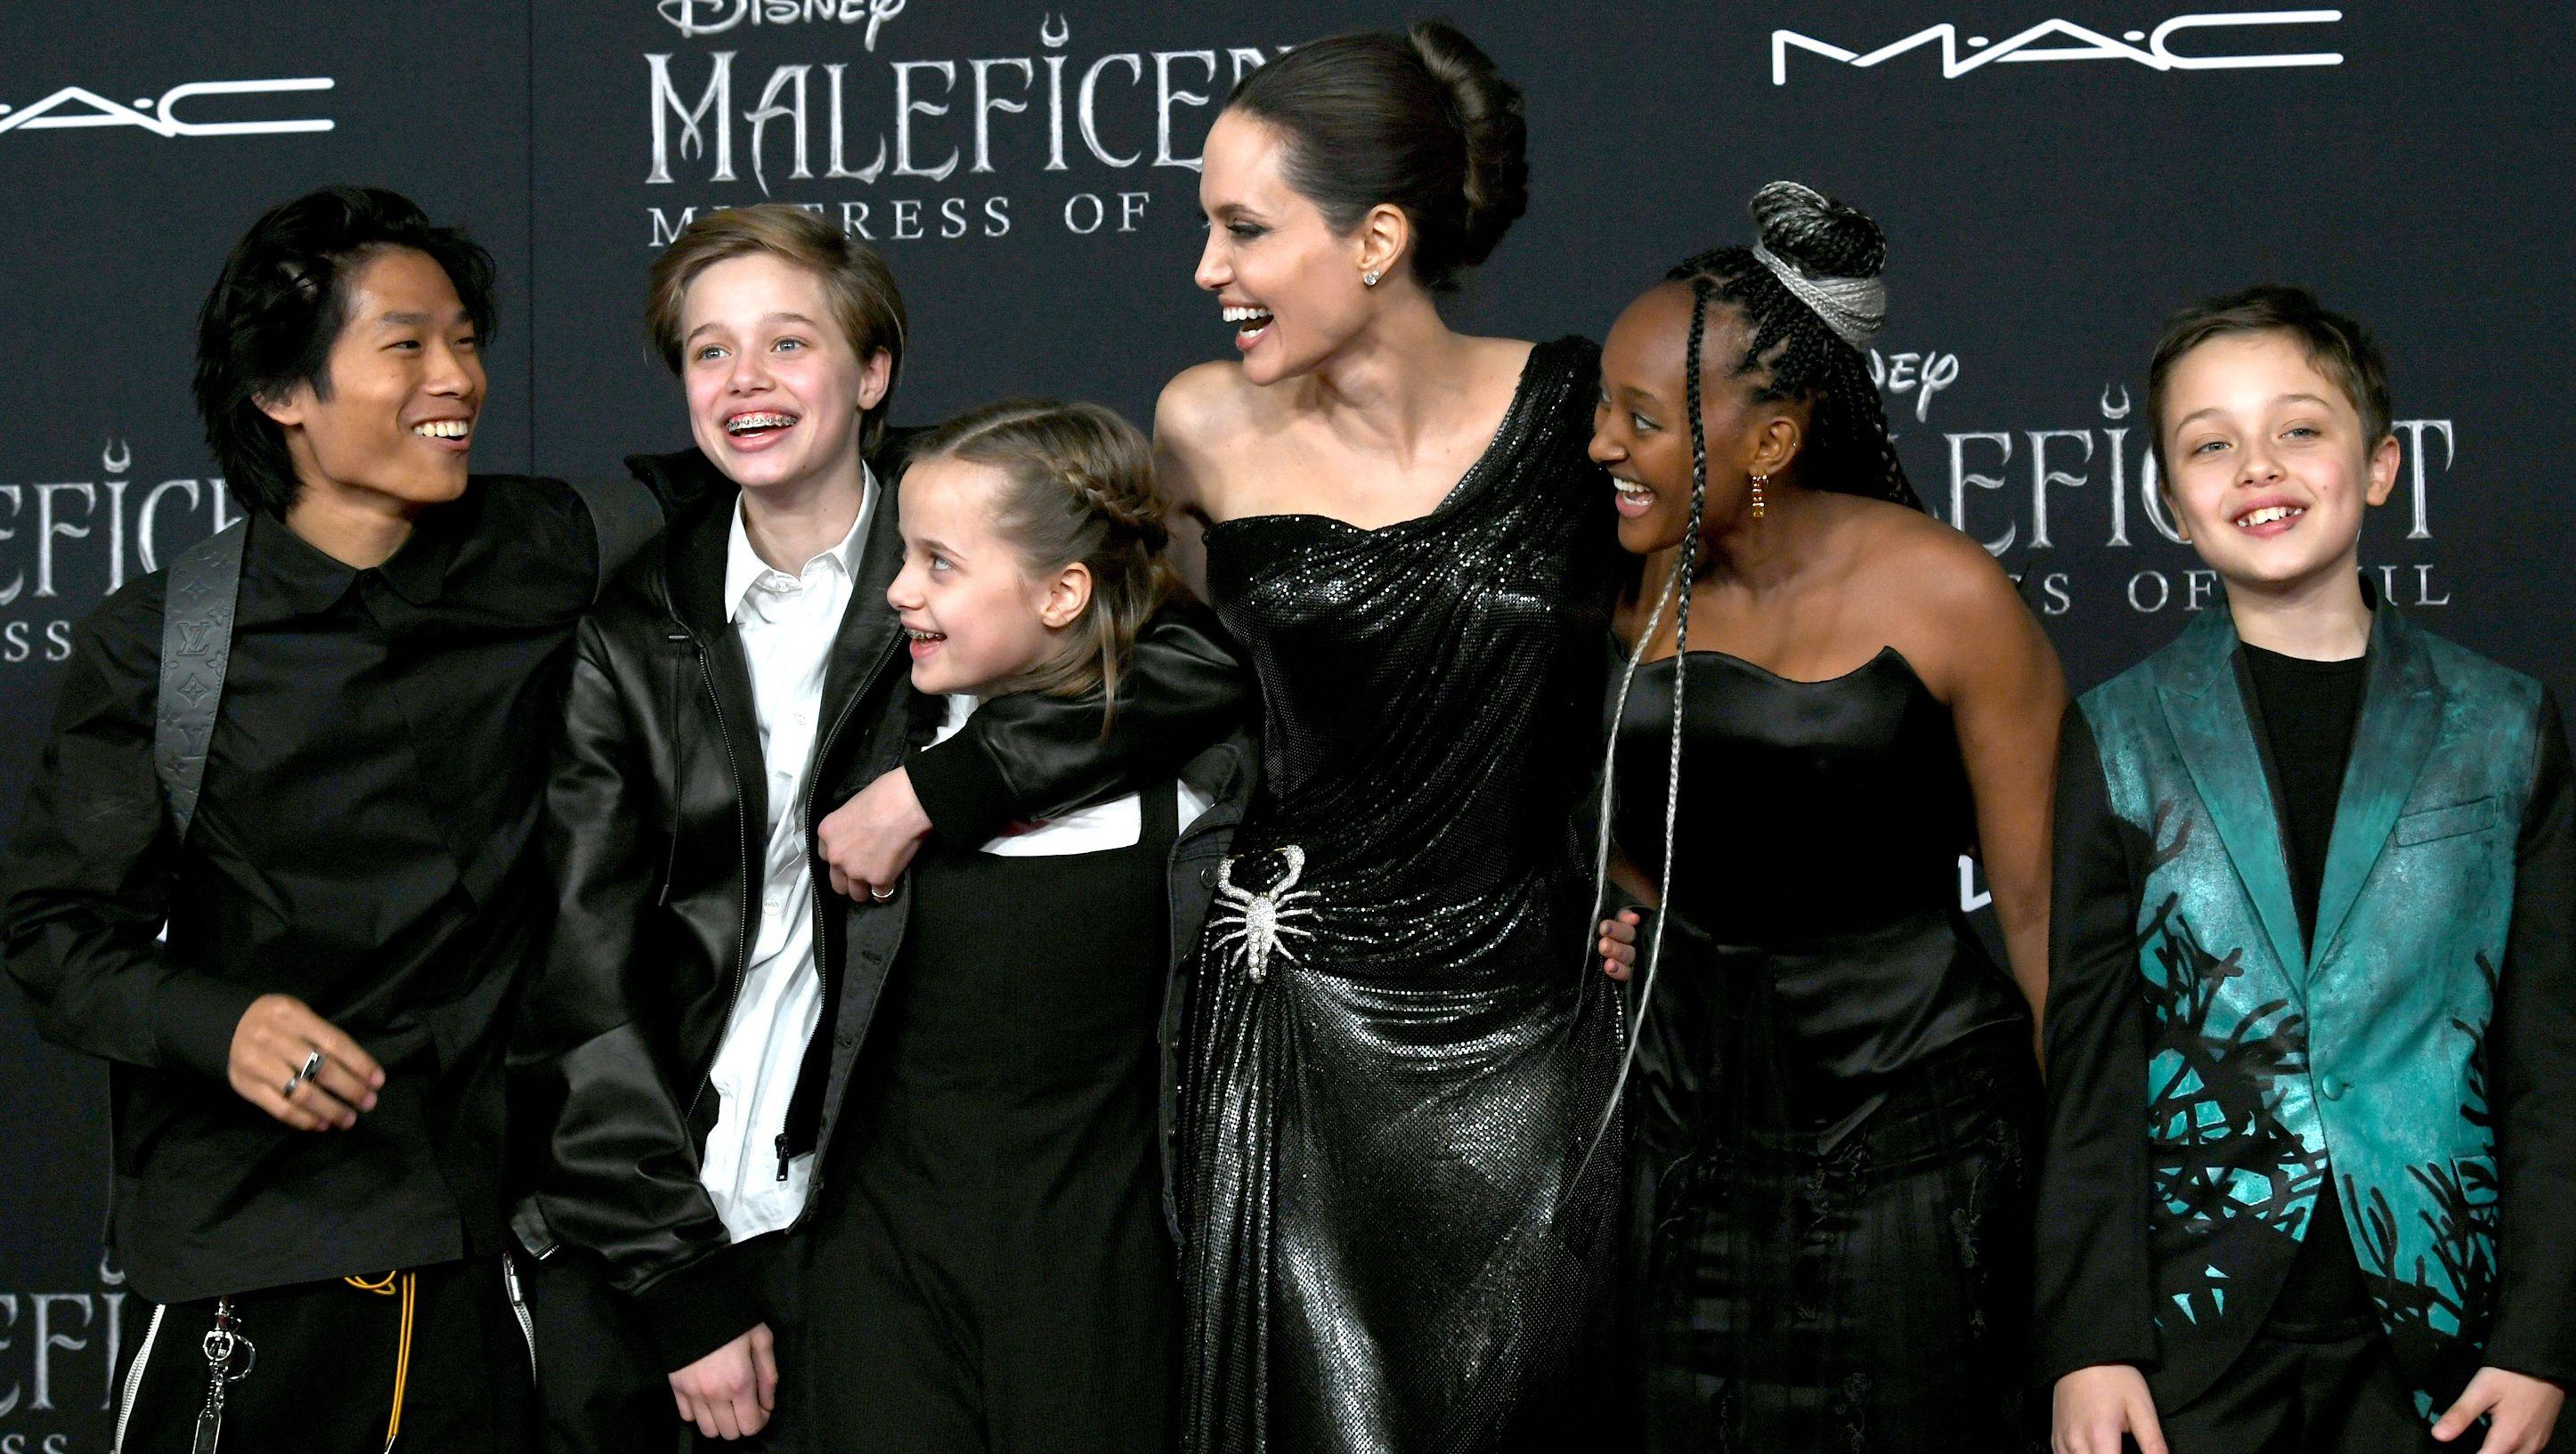 Angelina Jolie Rocks Sparkling Scorpion Dress At Maleficent